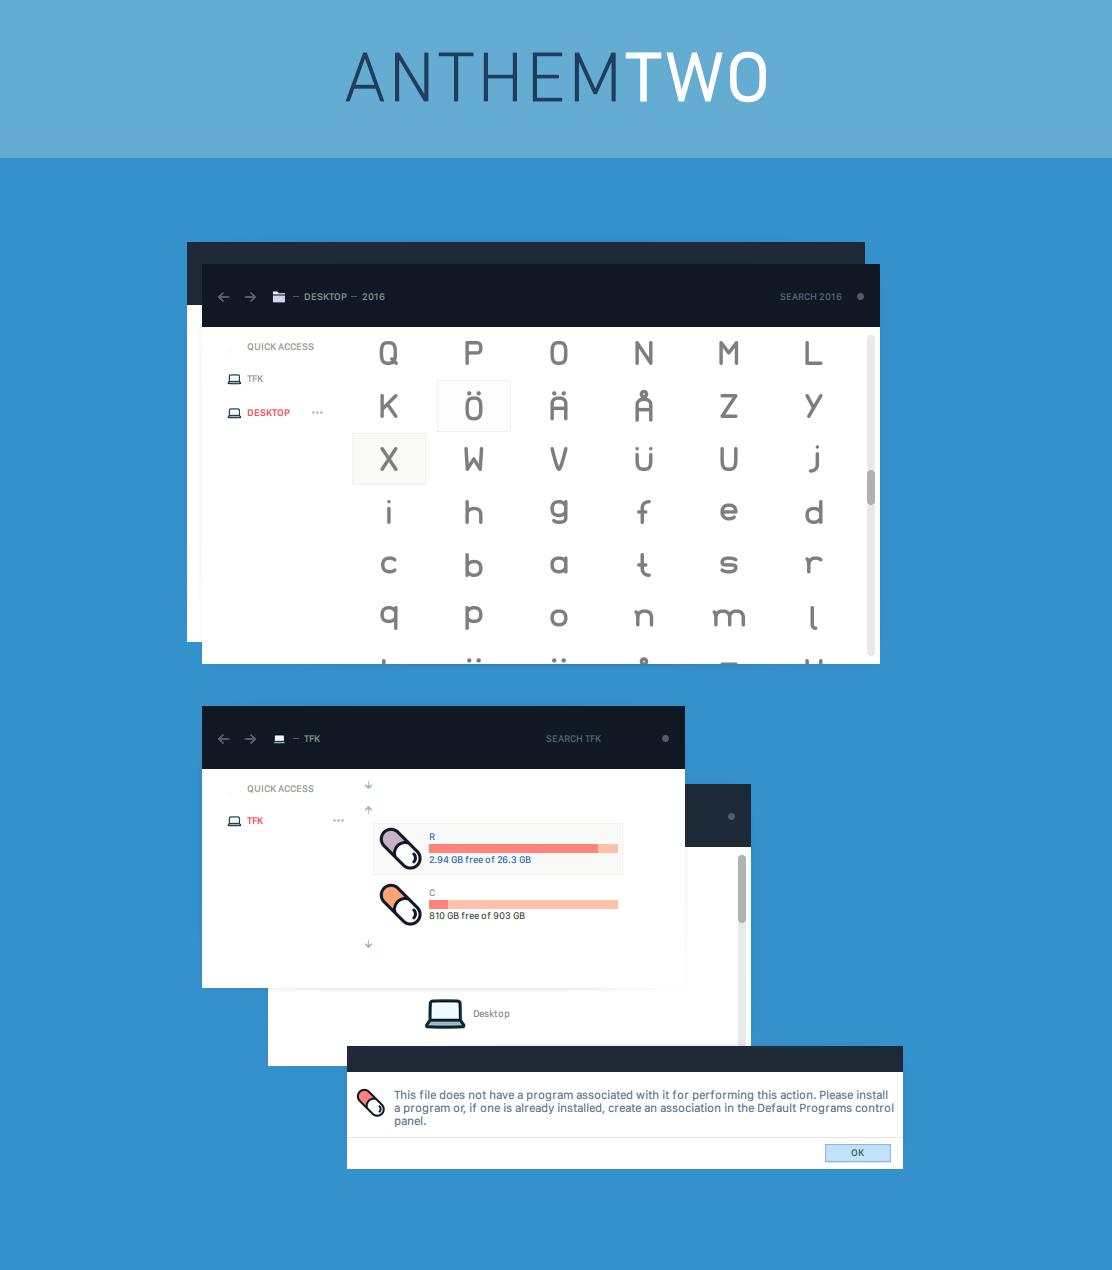 ANTHEM TWO - Windows 10